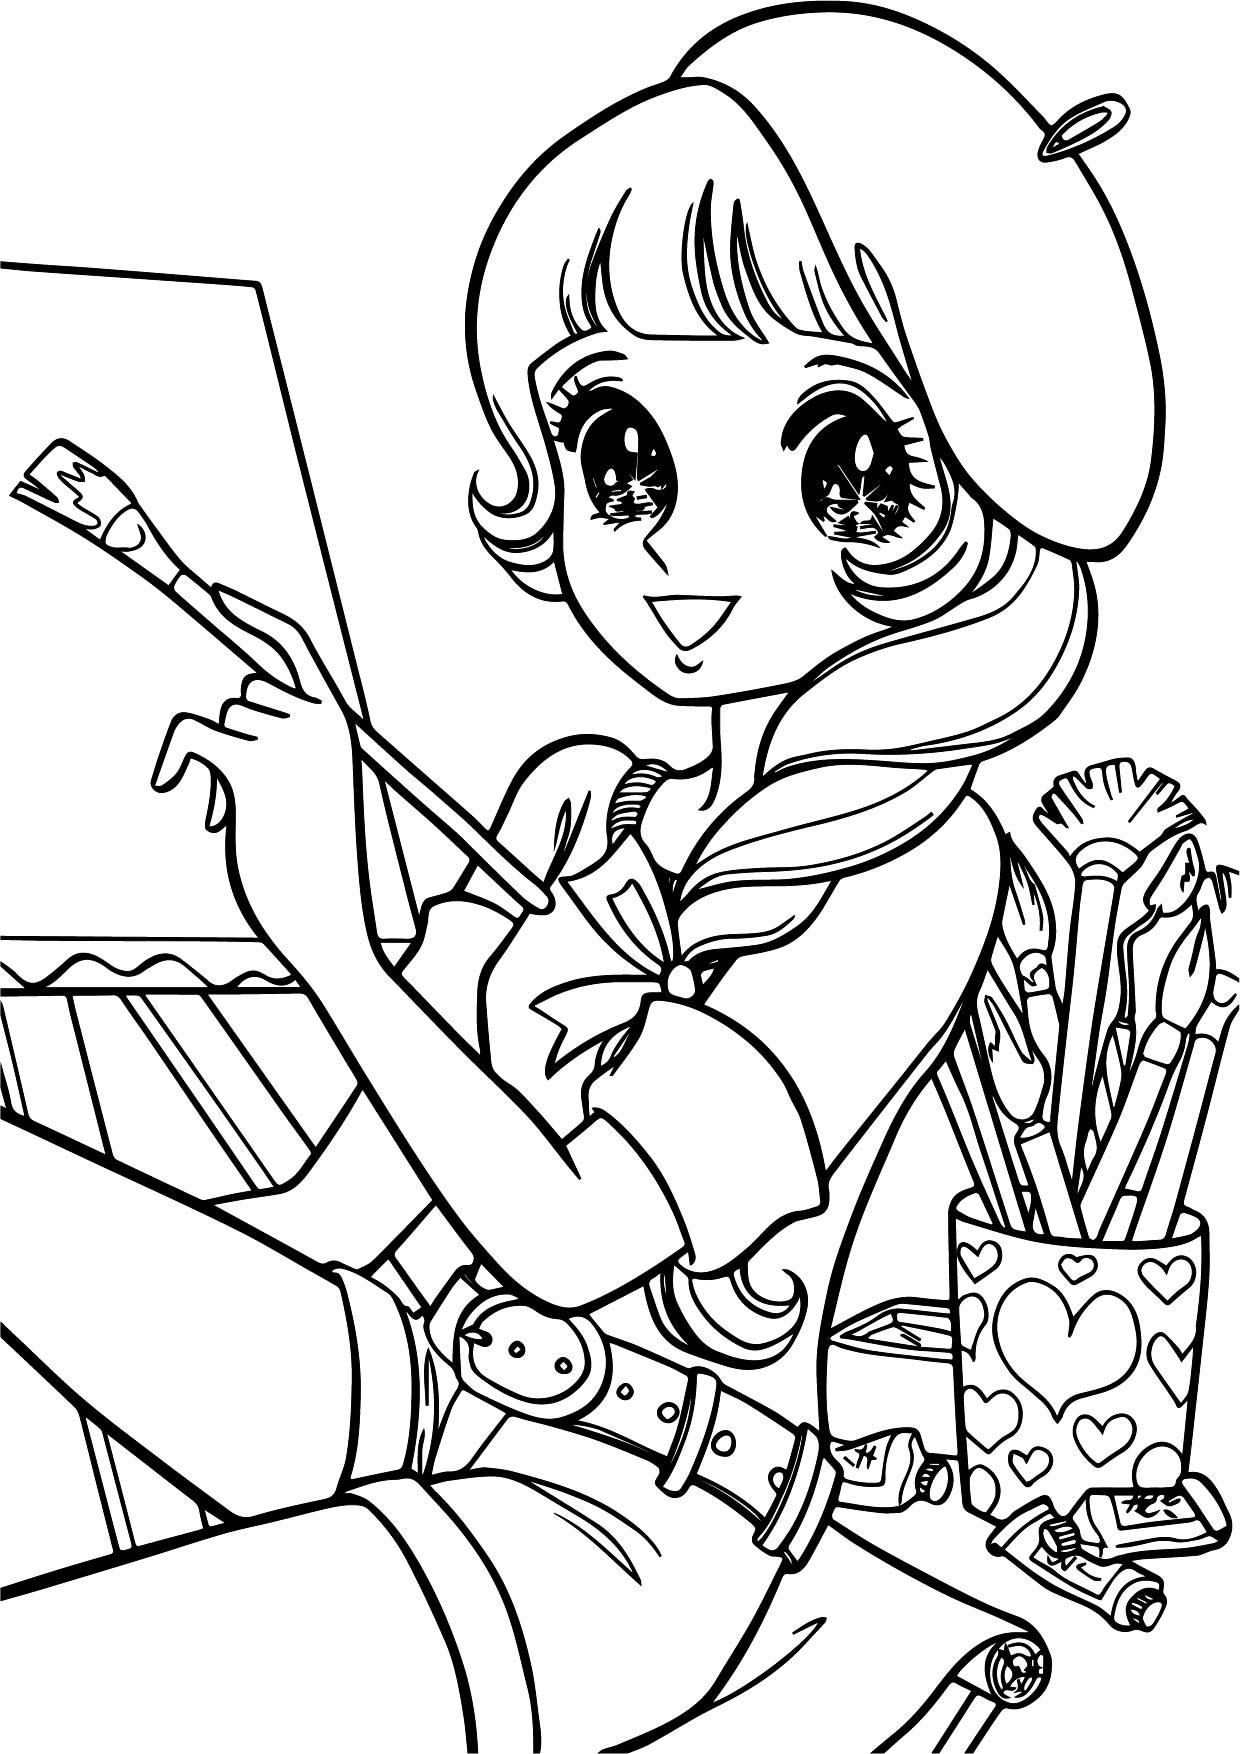 Aeromachia shojo manga no memory painter girl coloring for Manga girl coloring pages